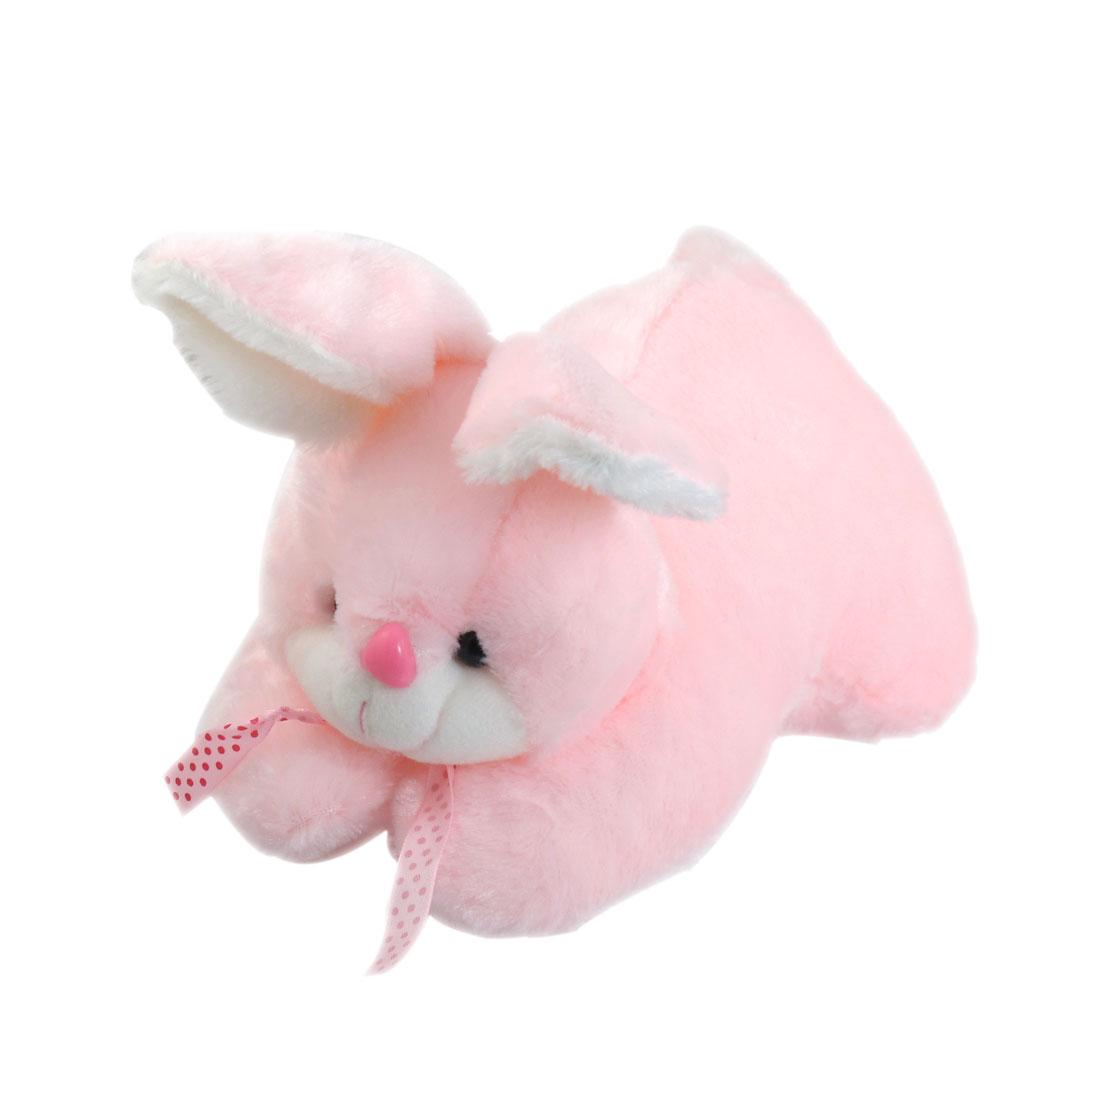 "11.8"" Length Pink Cute Plush Stuffed Fuzzy Play Tummy Rabbit Toy"